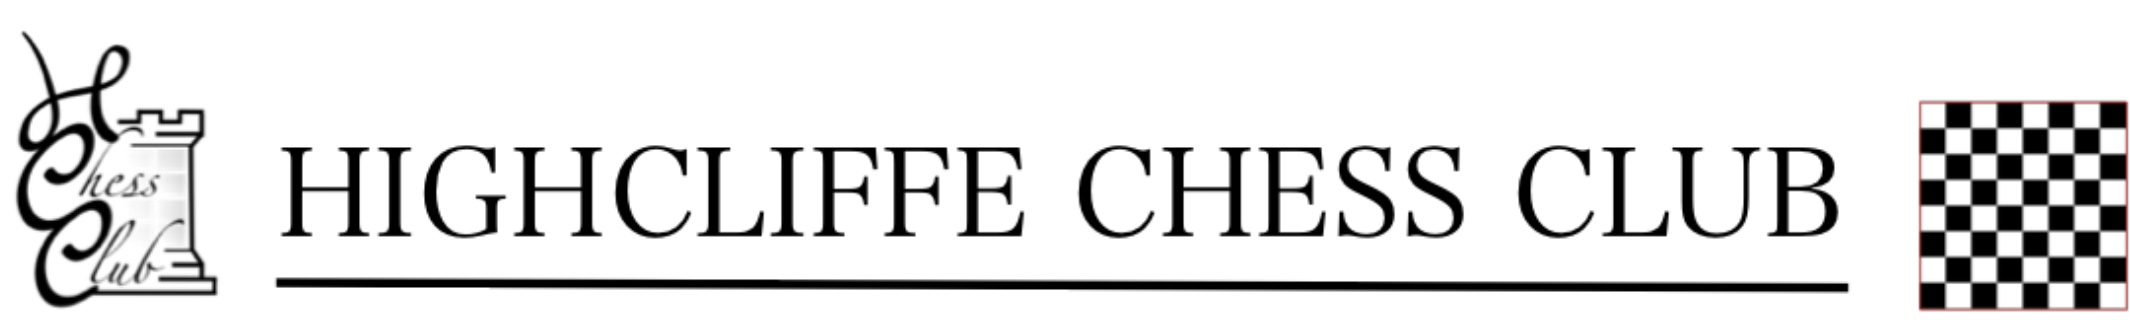 Highcliffe Chess Club